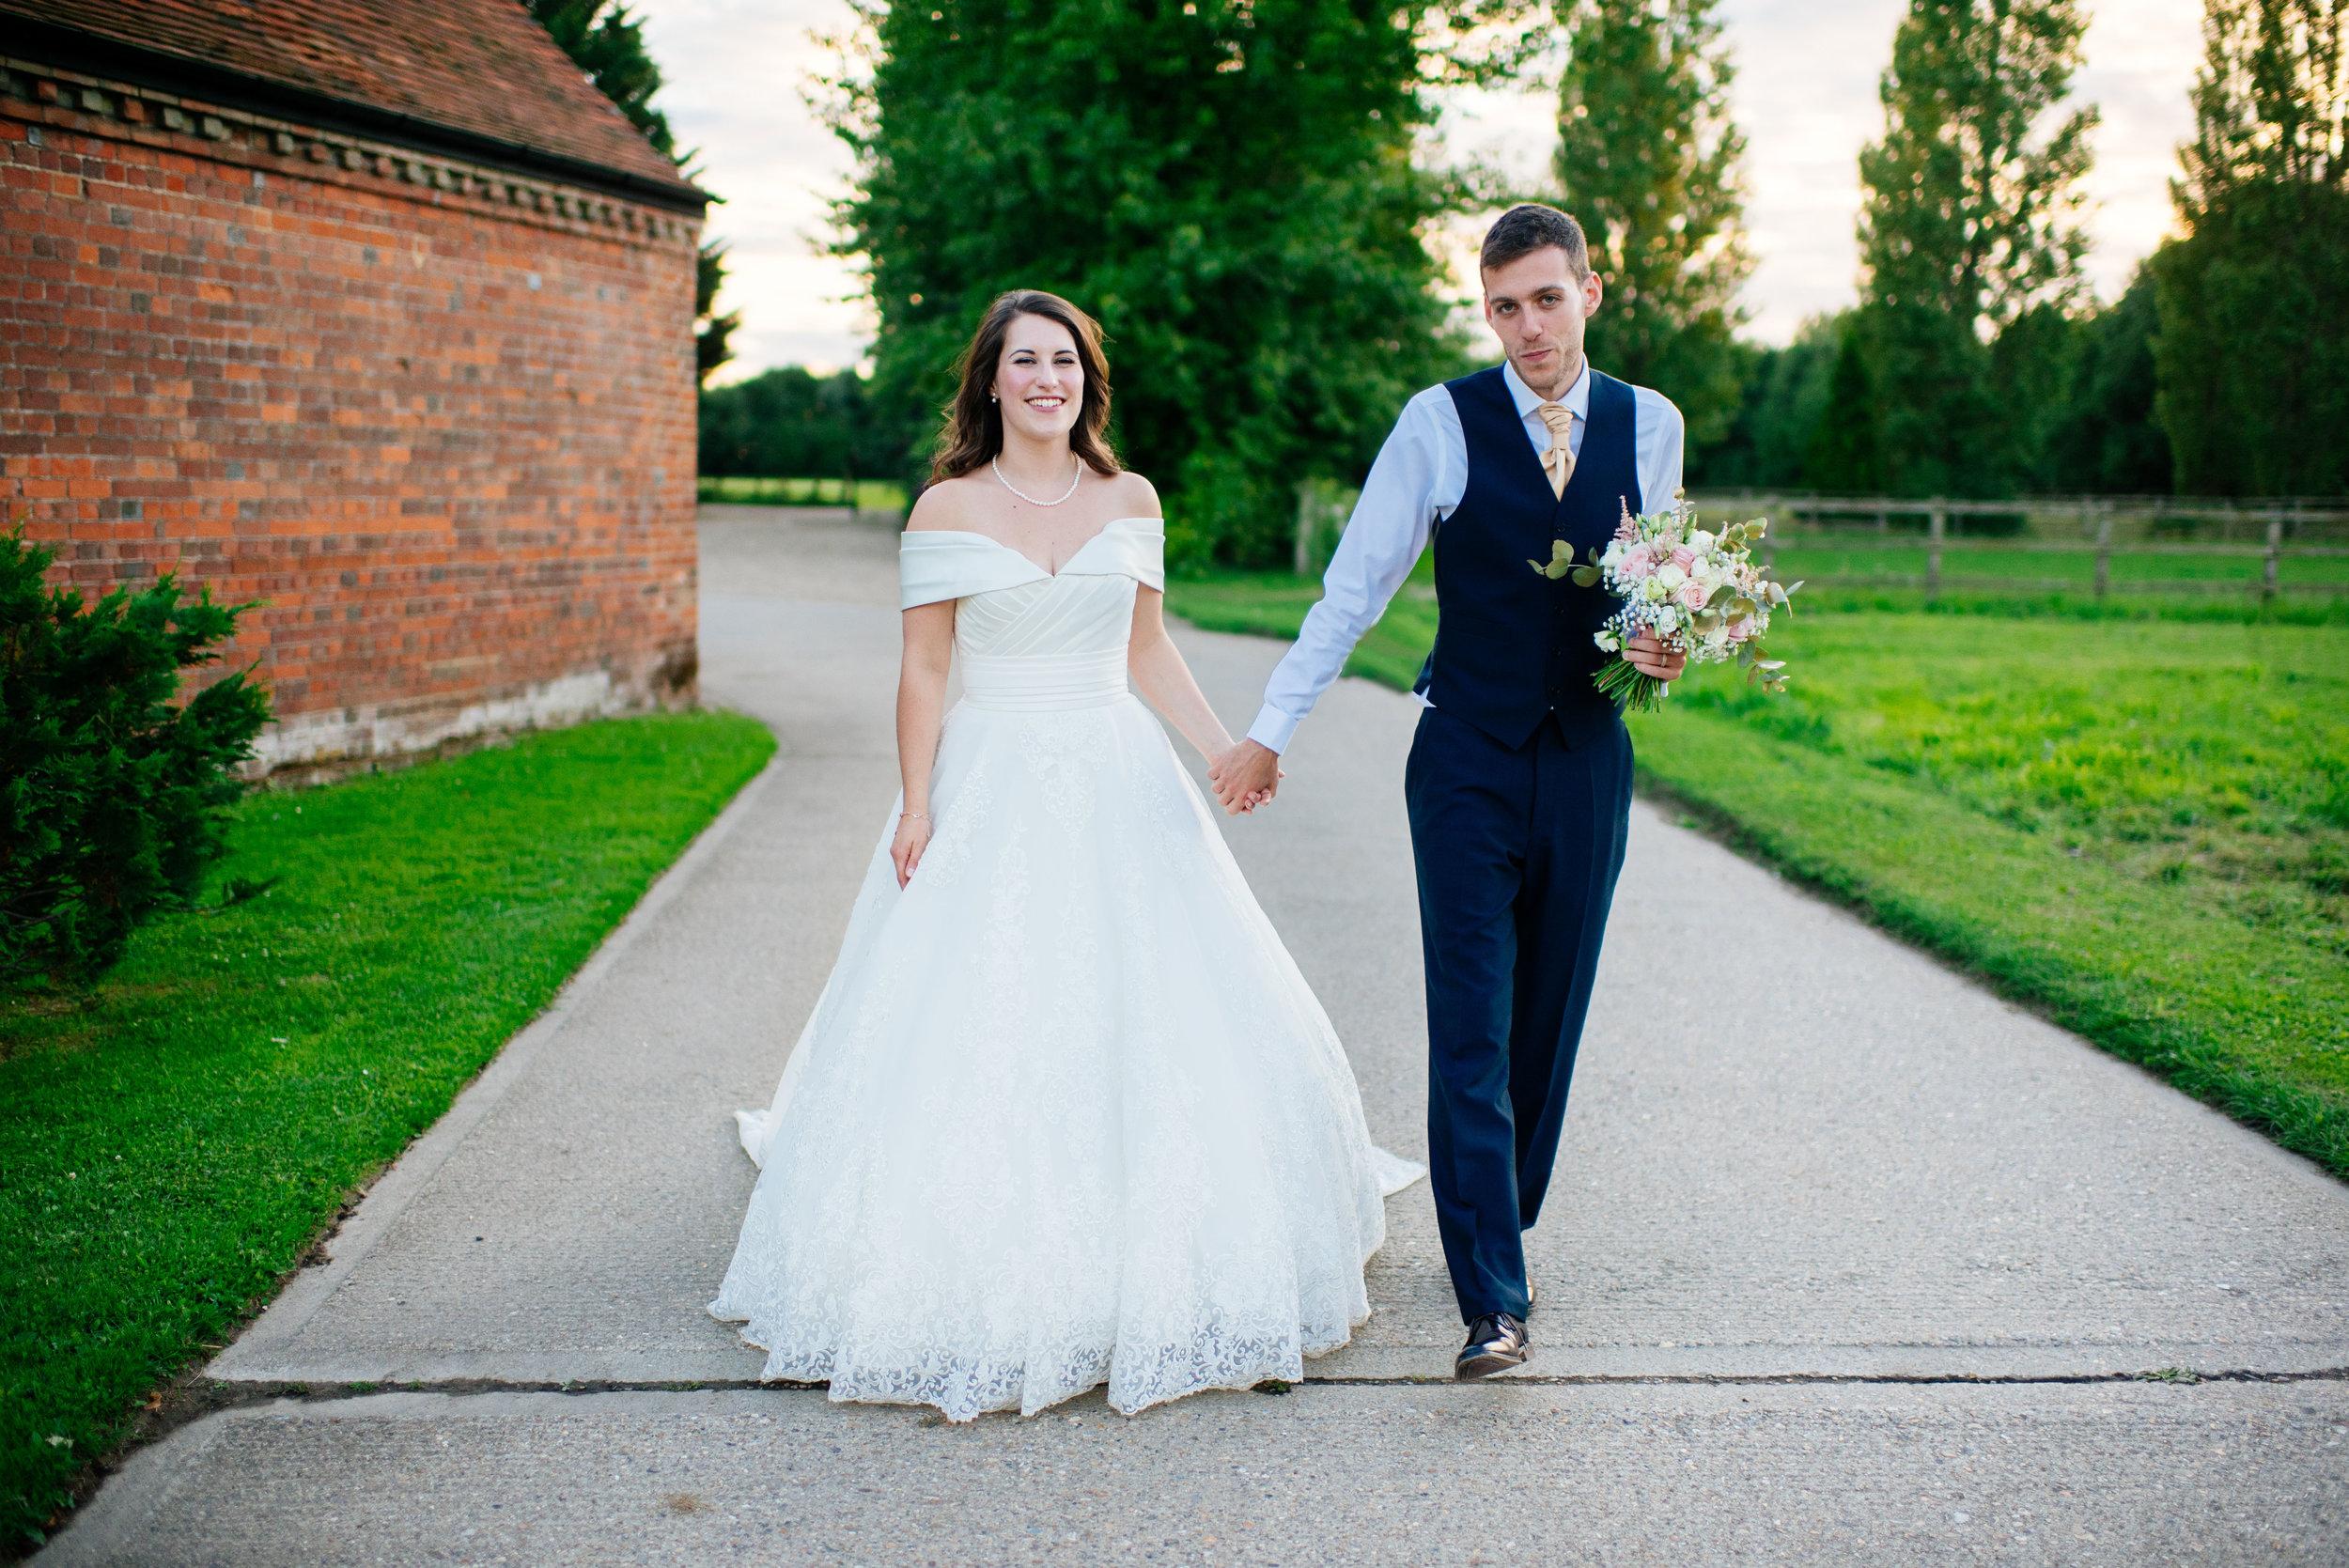 32 Lillibrooke Manor Berkshire Boy Girl Walking Wedding Photography.jpg